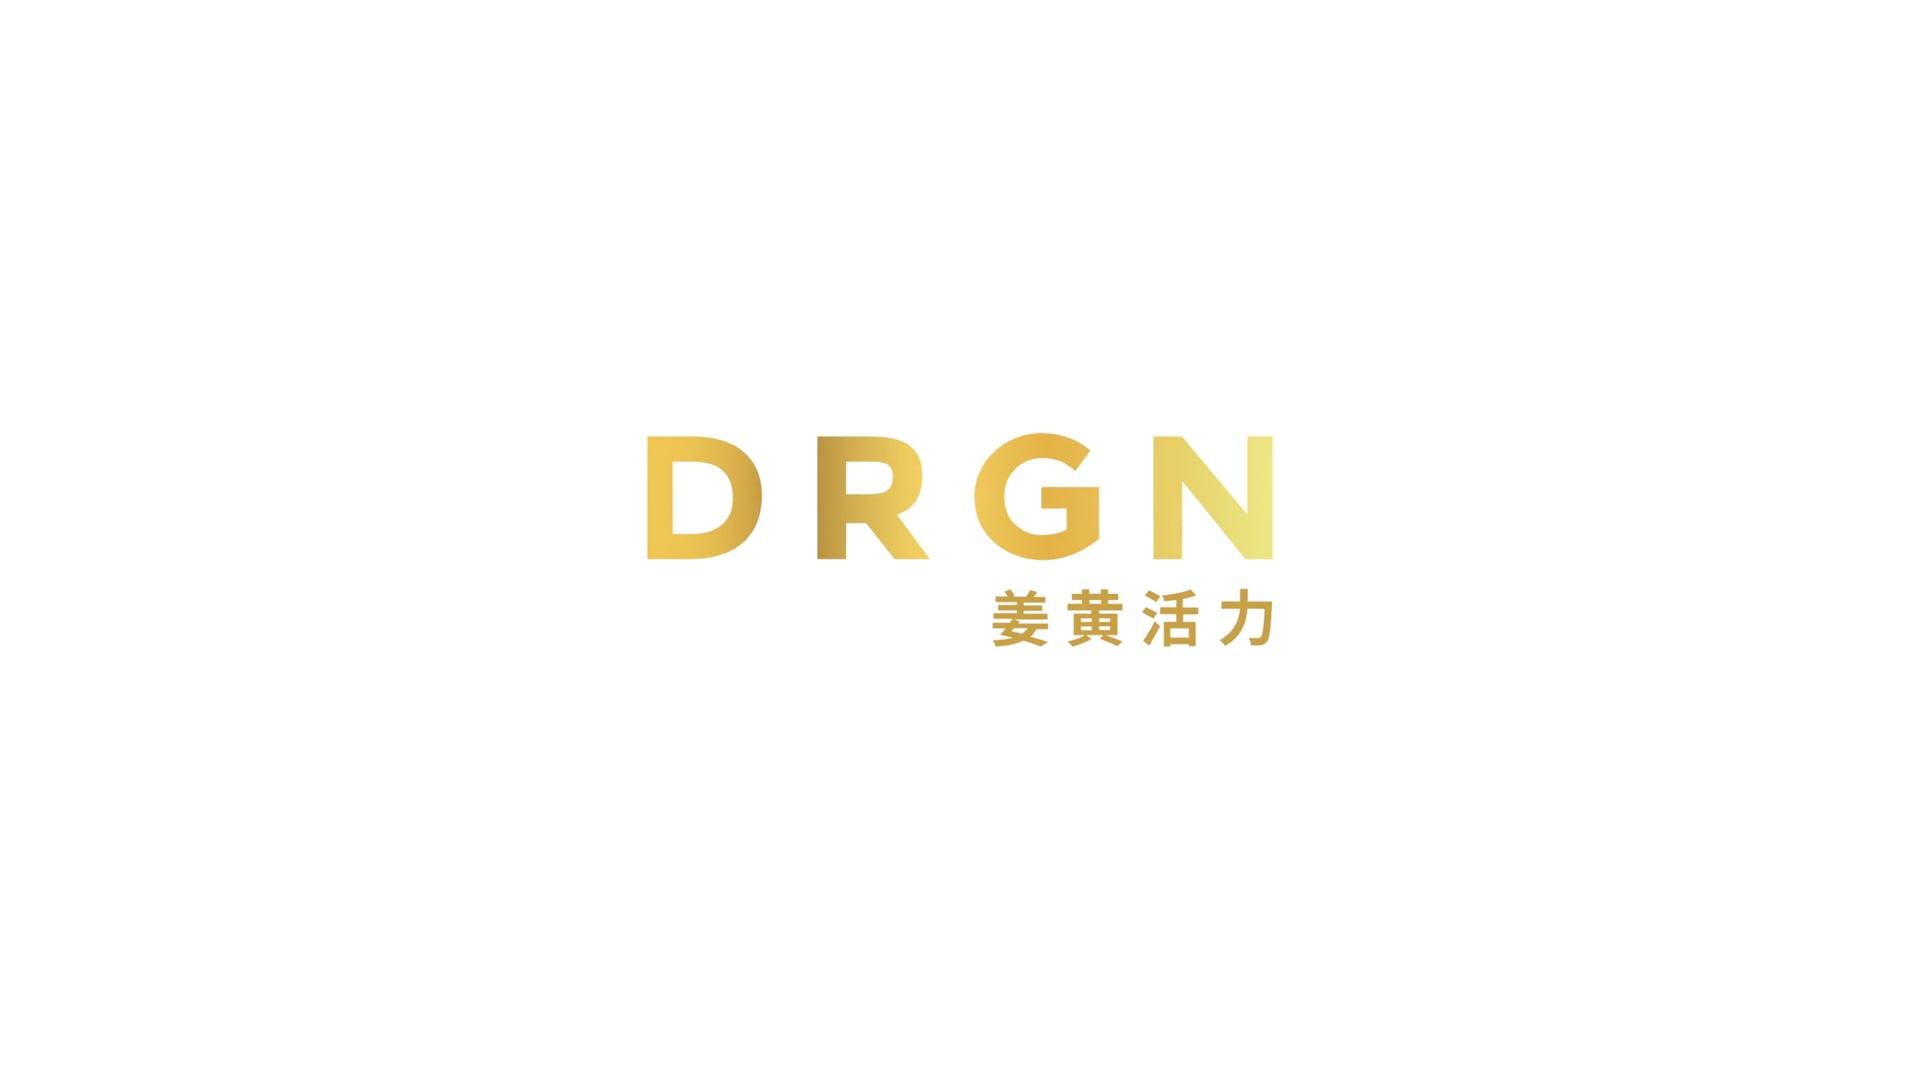 DRGN .mp4